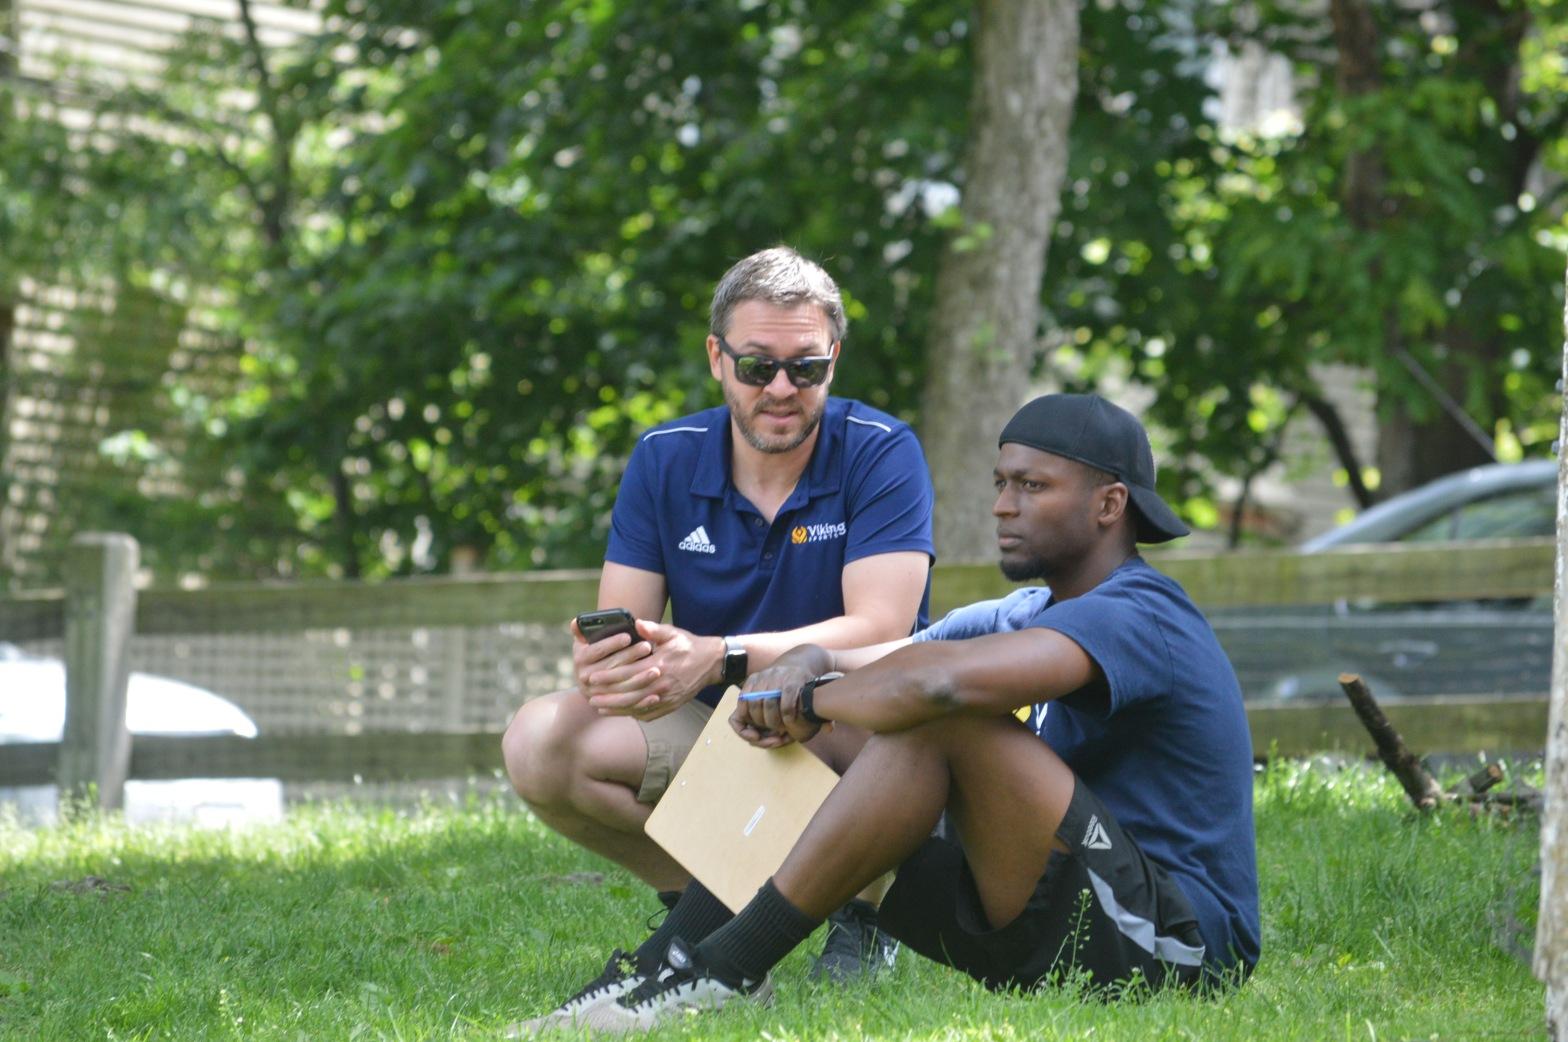 LeRoy Watkins and his business partner Zachary Lerman Viking Sports